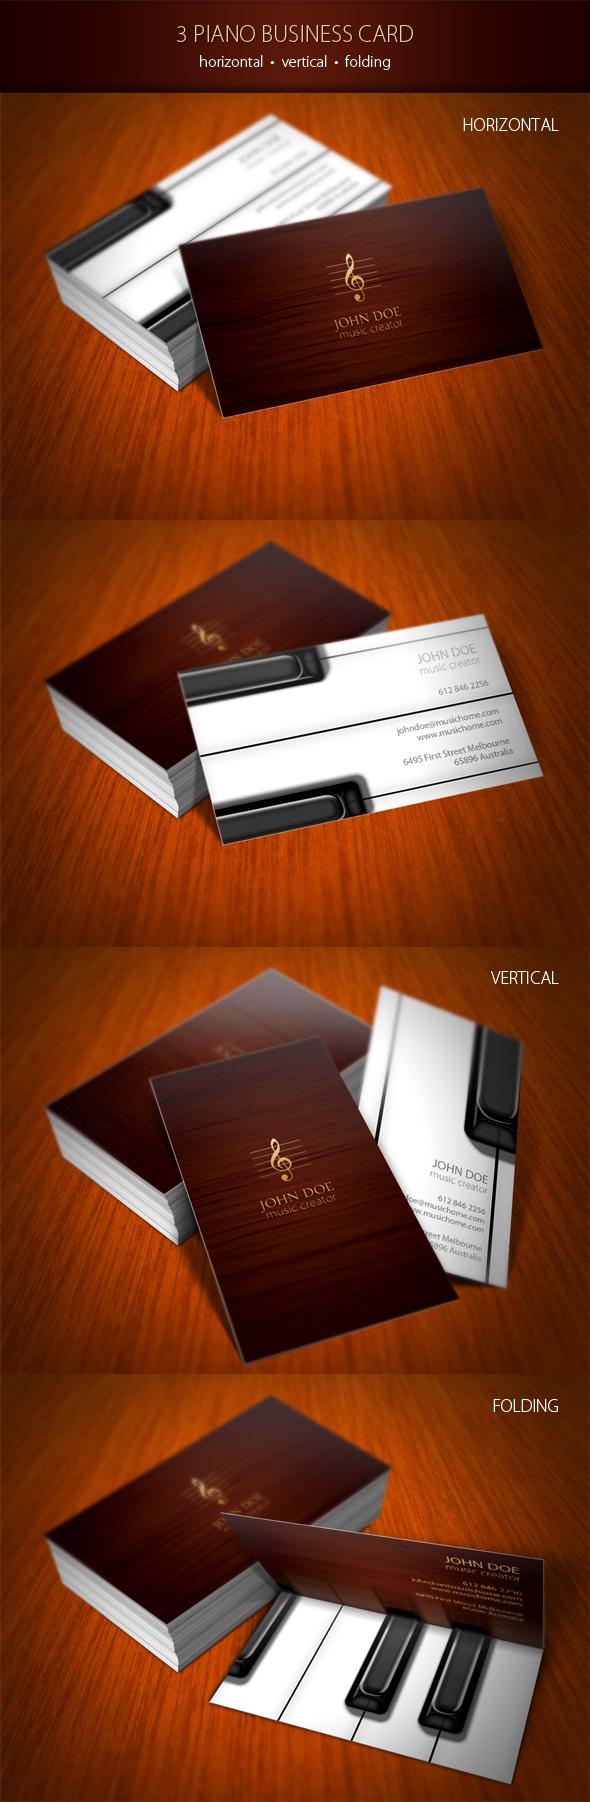 Piano business card brand identity wood creative Original business media studio Sing Singer melody